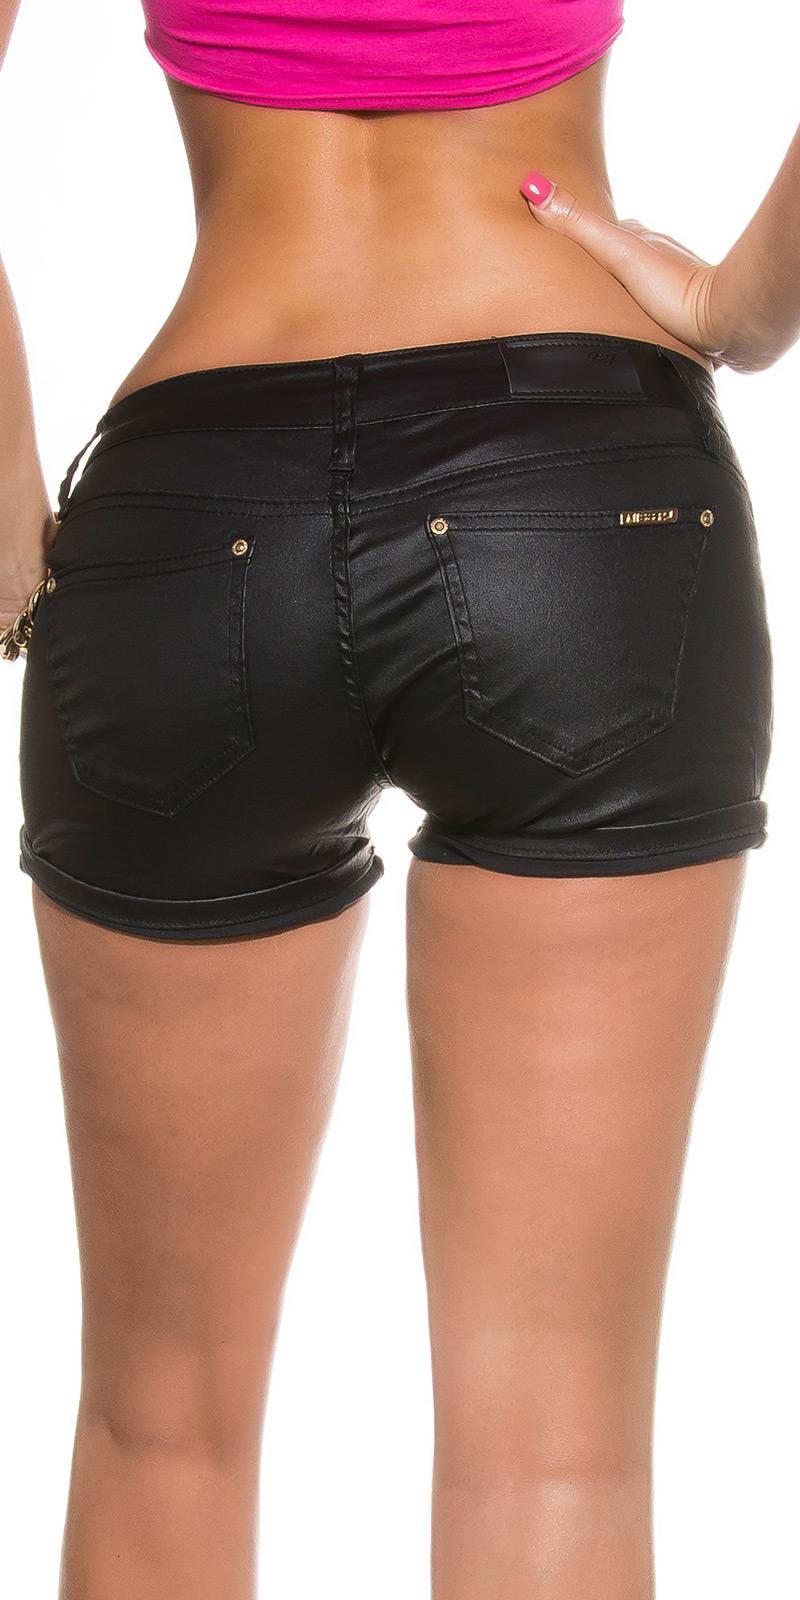 damen hot pants hotpants shorts kurze hose bermuda im. Black Bedroom Furniture Sets. Home Design Ideas